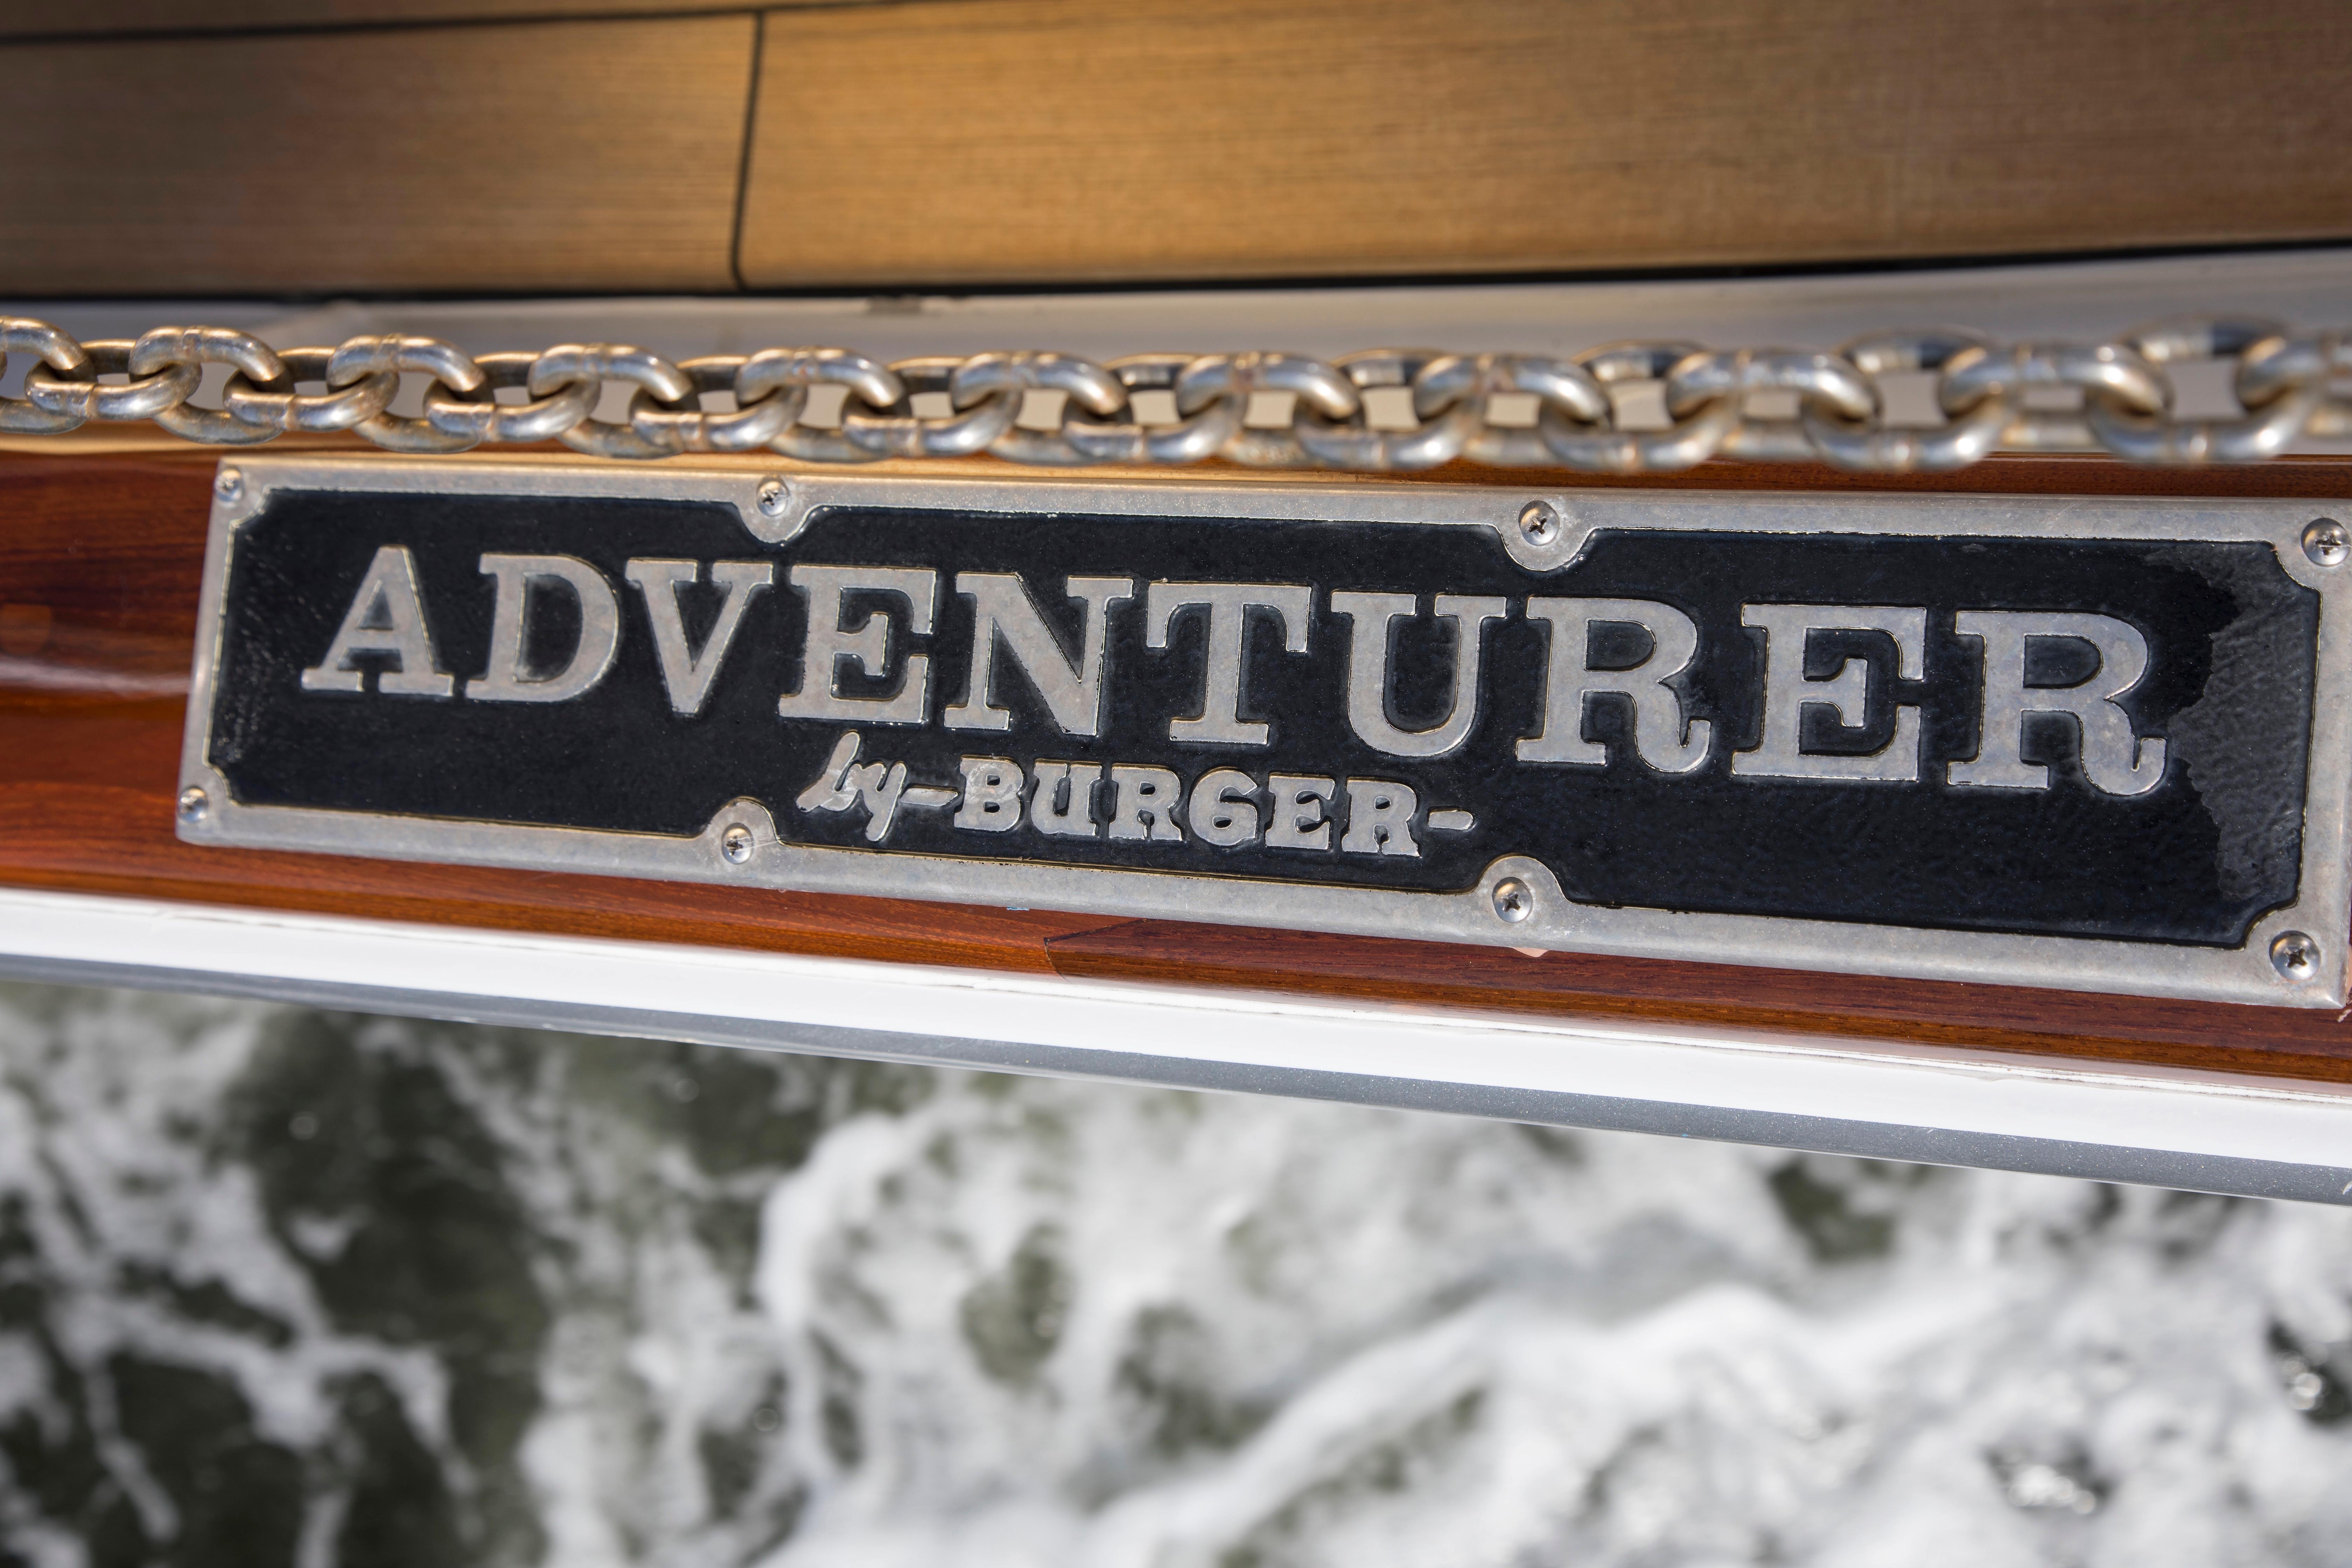 94 Burger Adventurer 1985 Cap Cana | Denison Yacht Sales